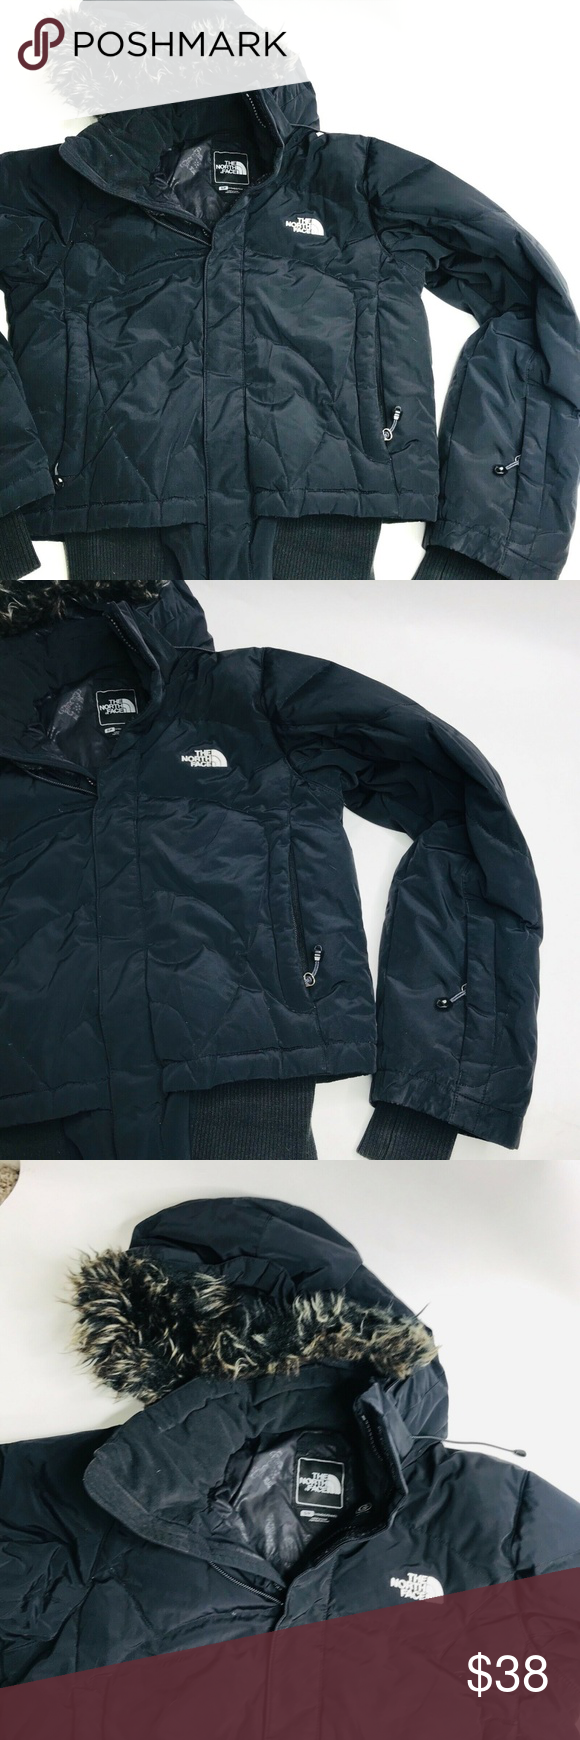 Hooded Down Jacket Down jacket, Jackets for women, Fur